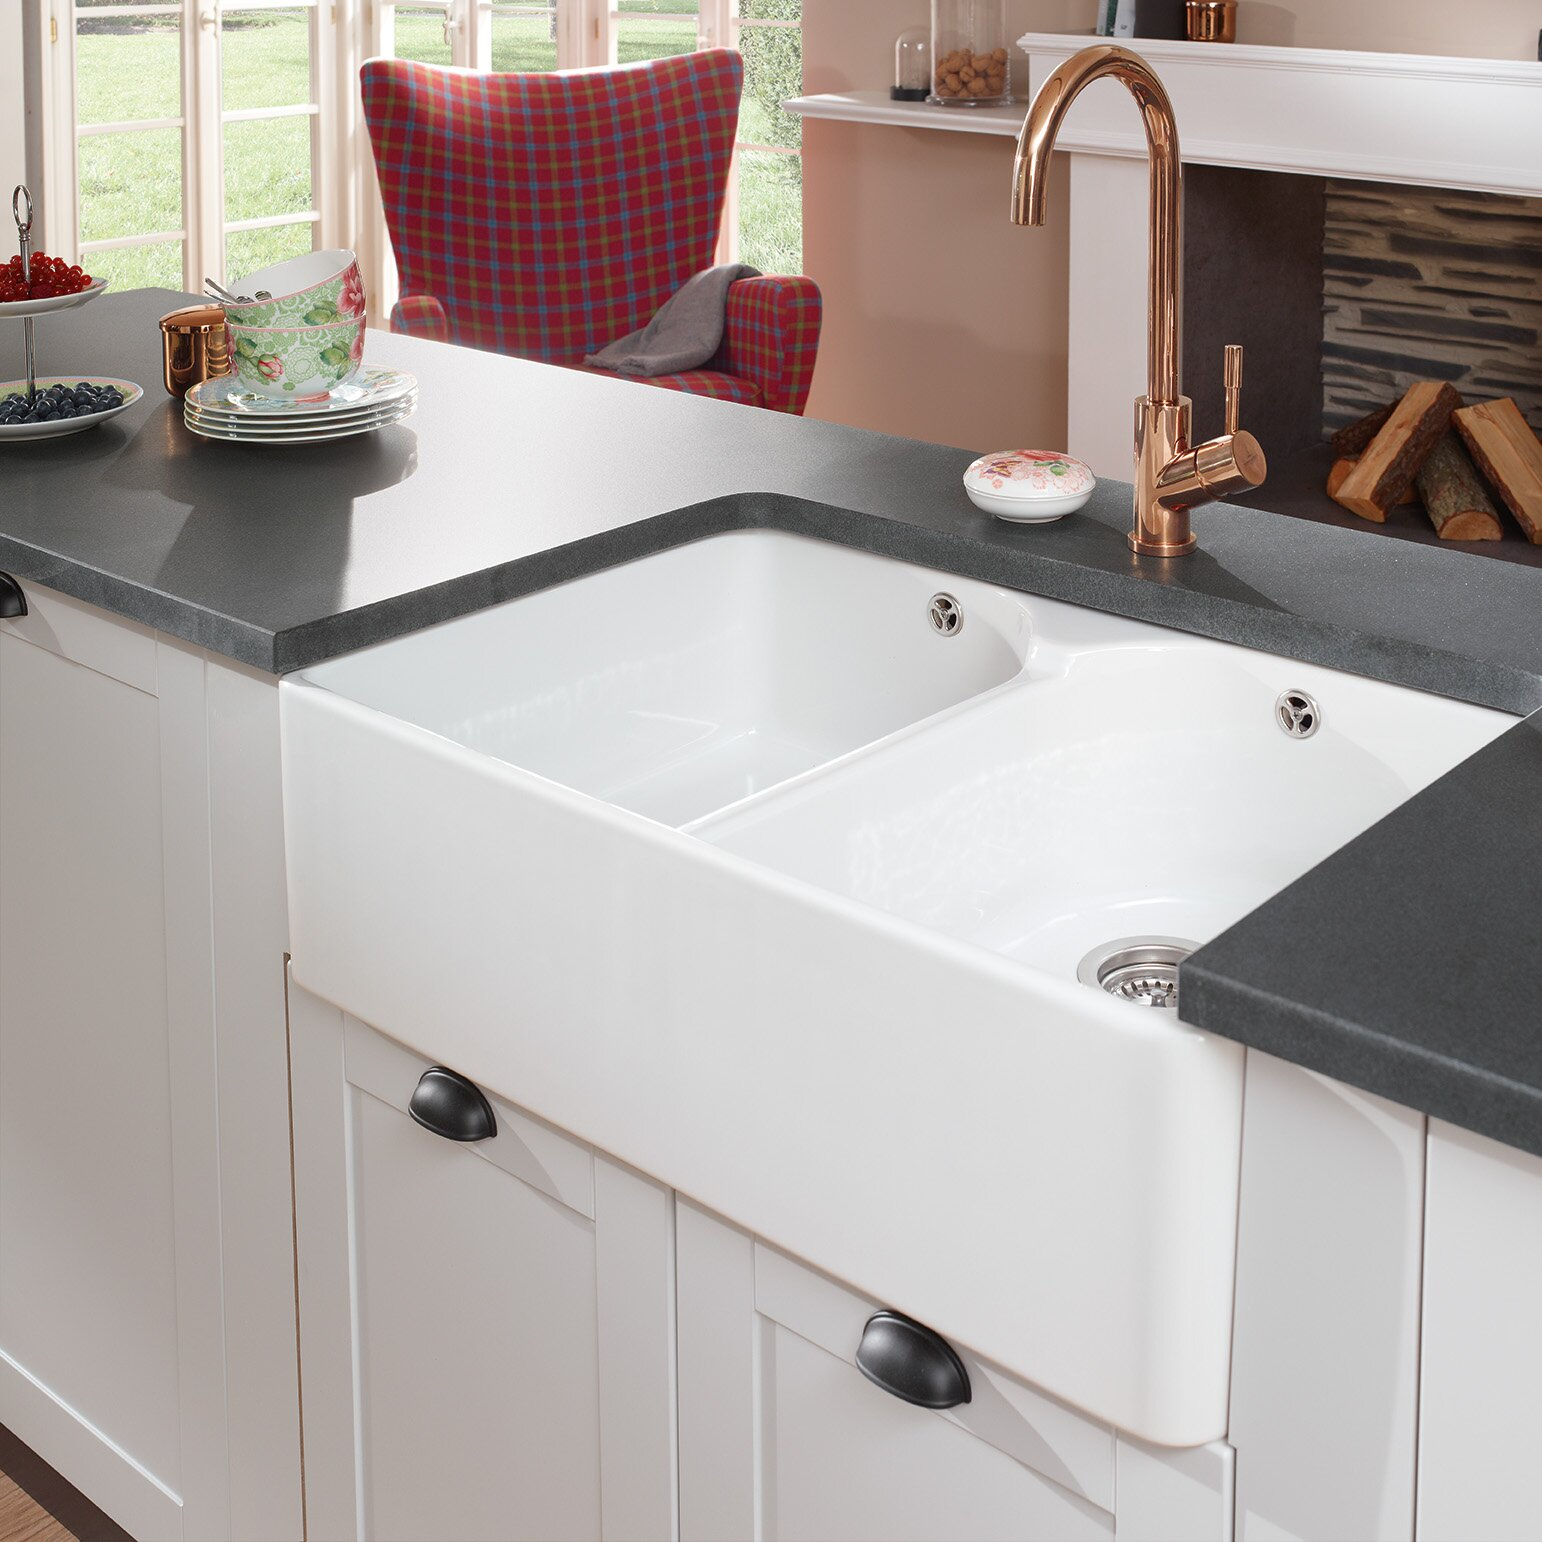 farmhouse 795cm x 50cm double bowl kitchen sink - Kitchen Sink Uk